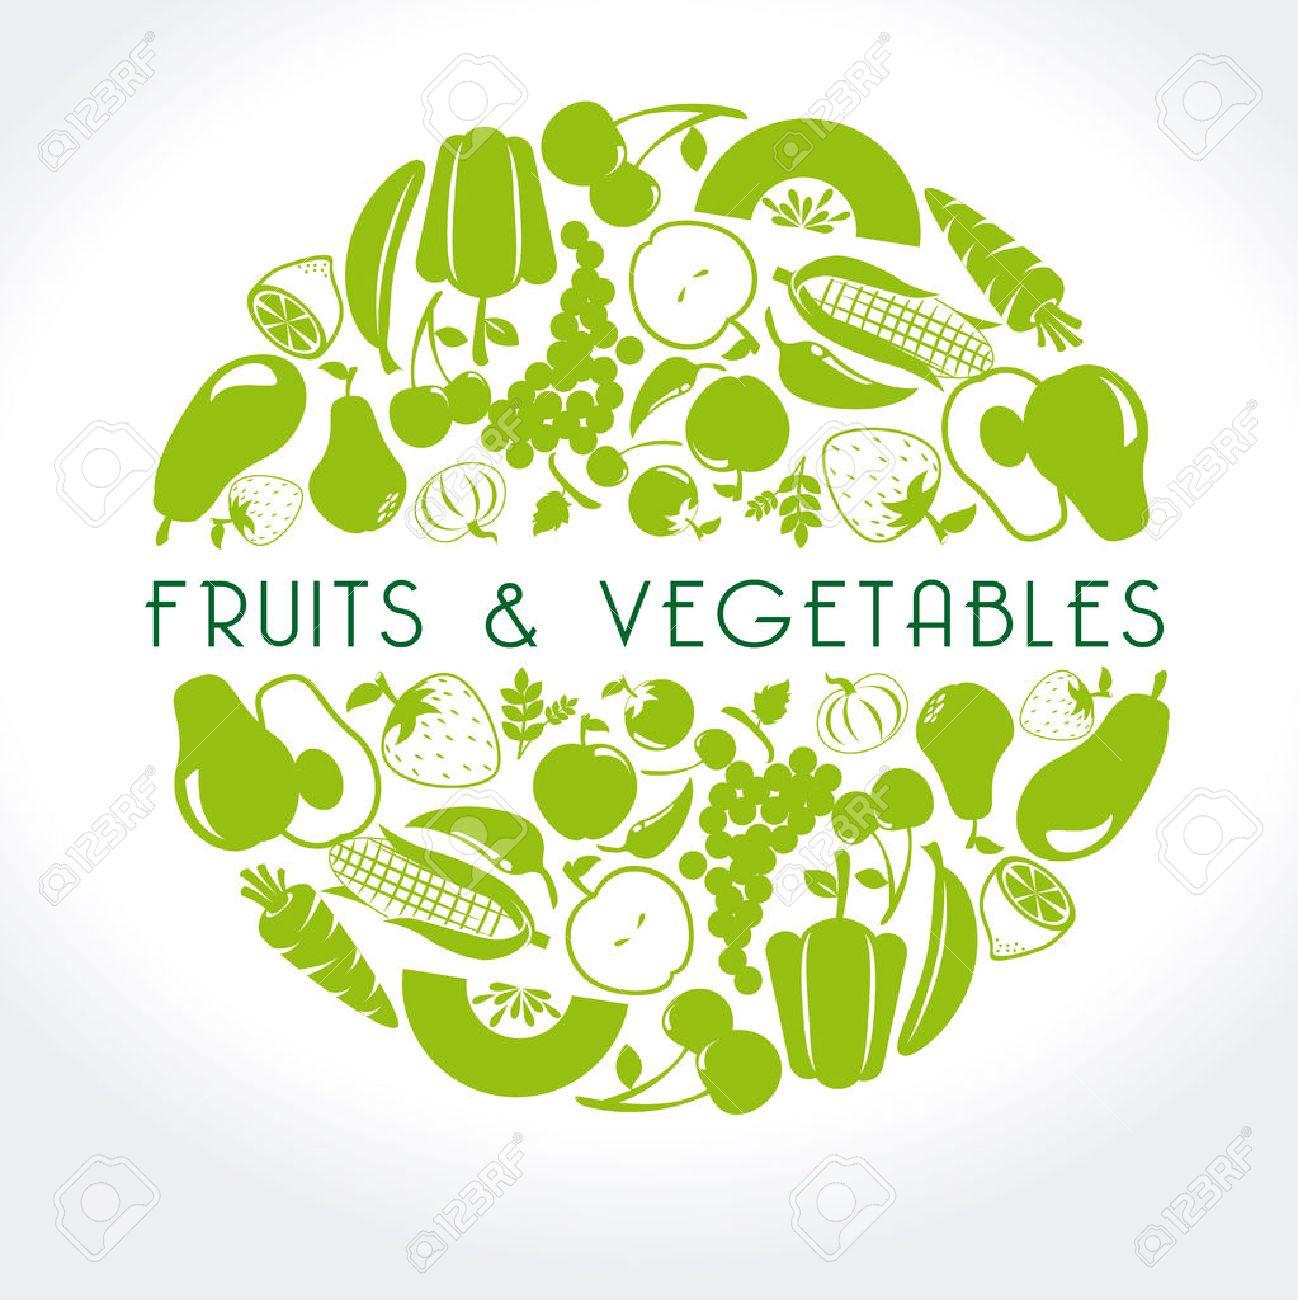 fruits and vegetables label over white background vector illustration - 22453129